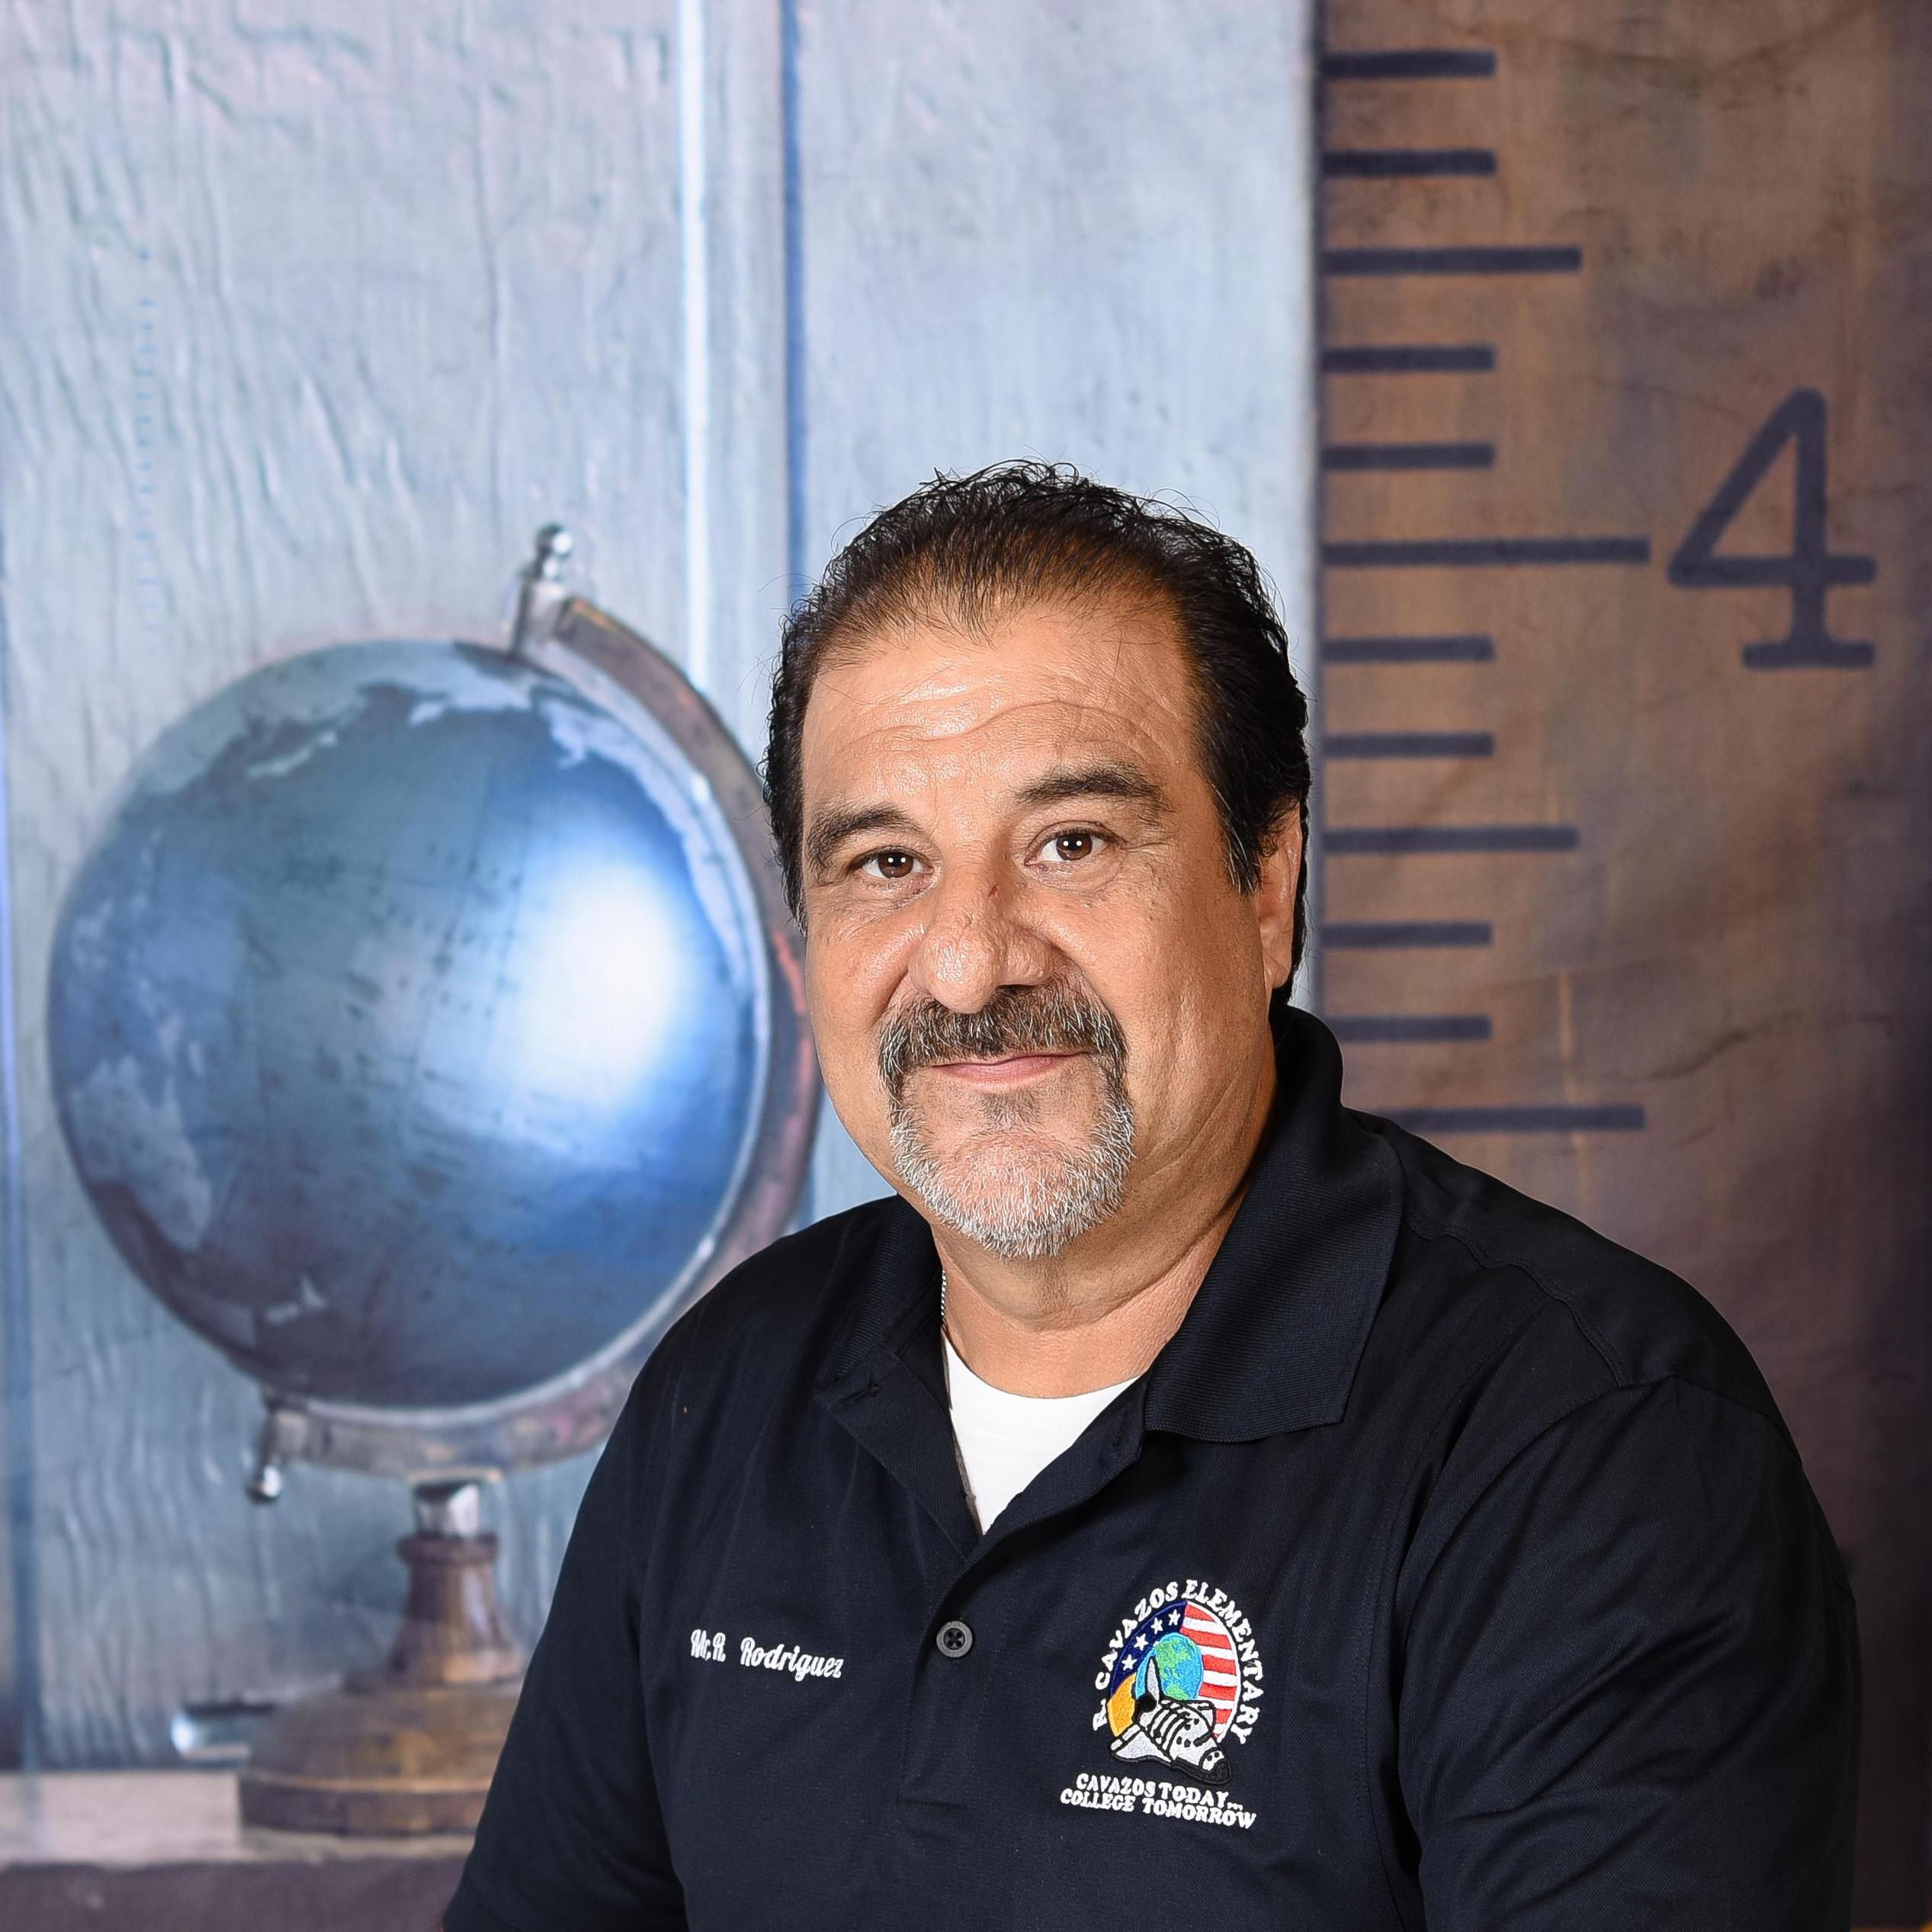 Robert Rodriguez's Profile Photo